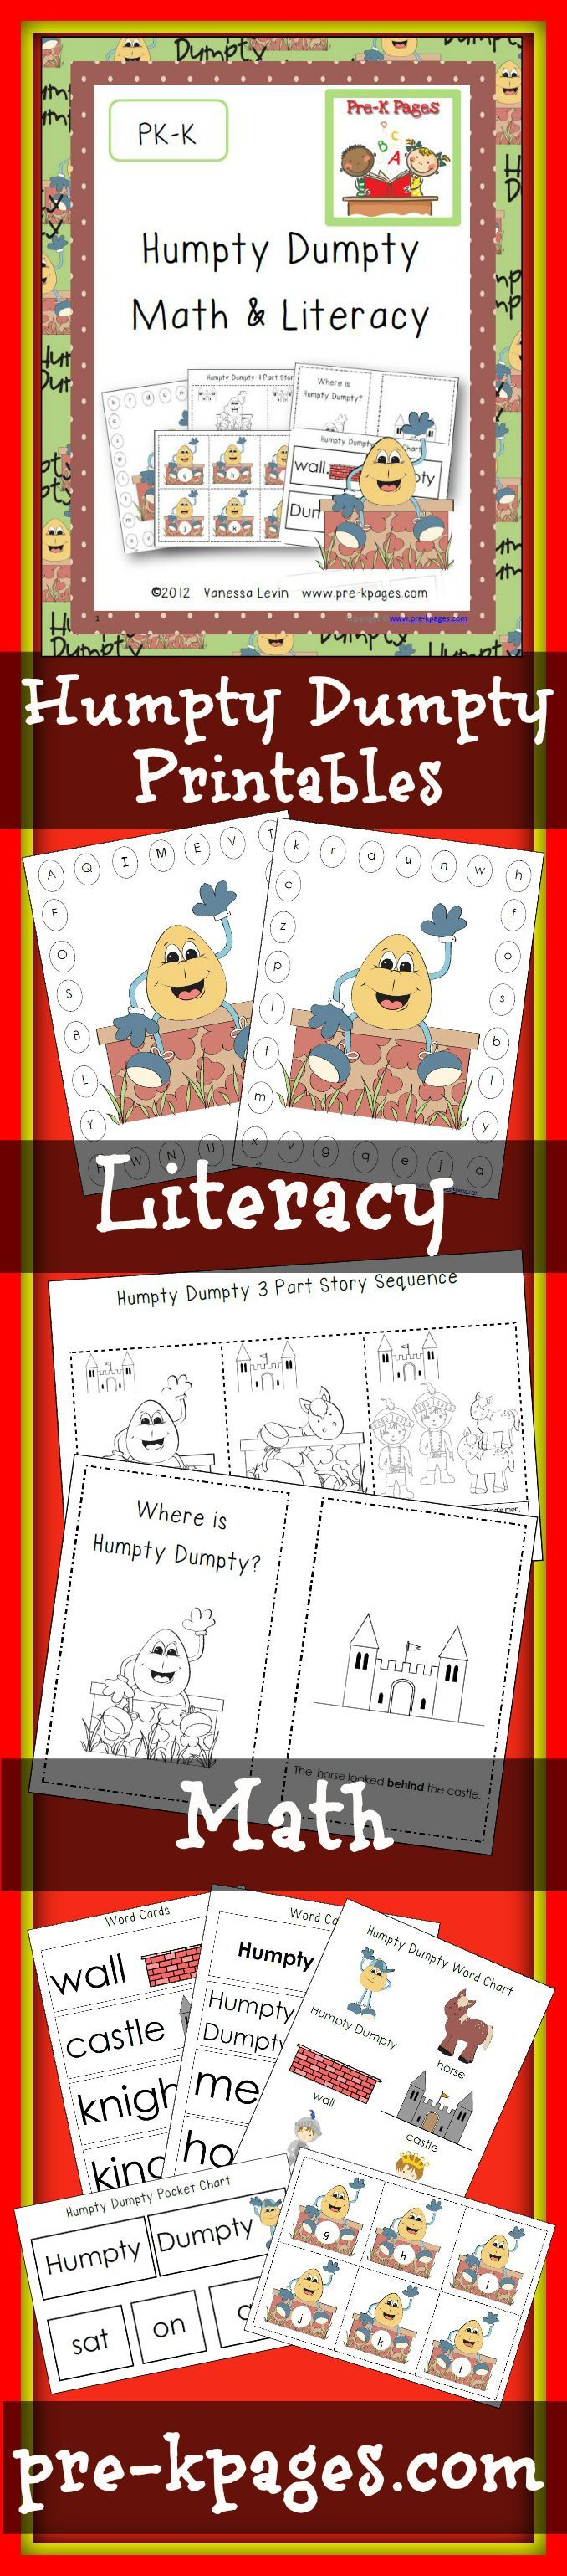 Humpty Dumpty Literacy and Math | Humpty dumpty, Prepositions and ...